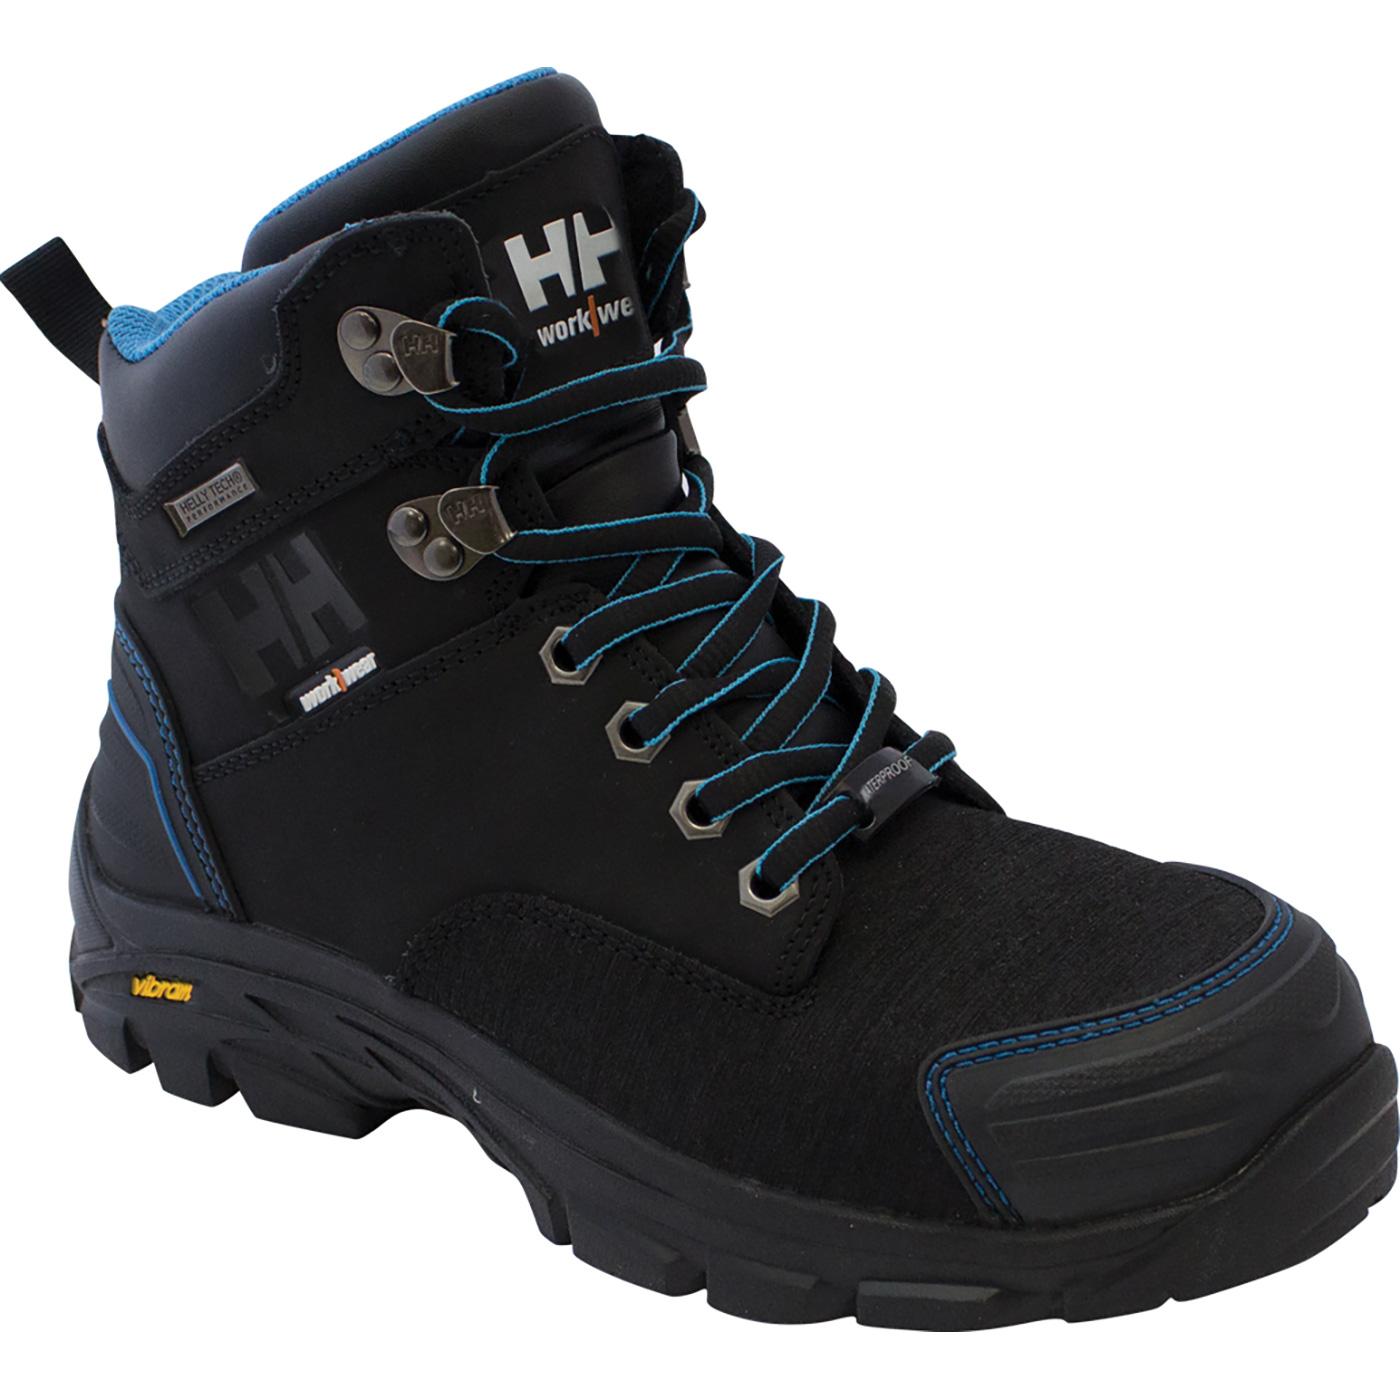 25d0d0f0414 Helly Hansen Bergen Women's 6 inch Black Leather Composite Toe ...